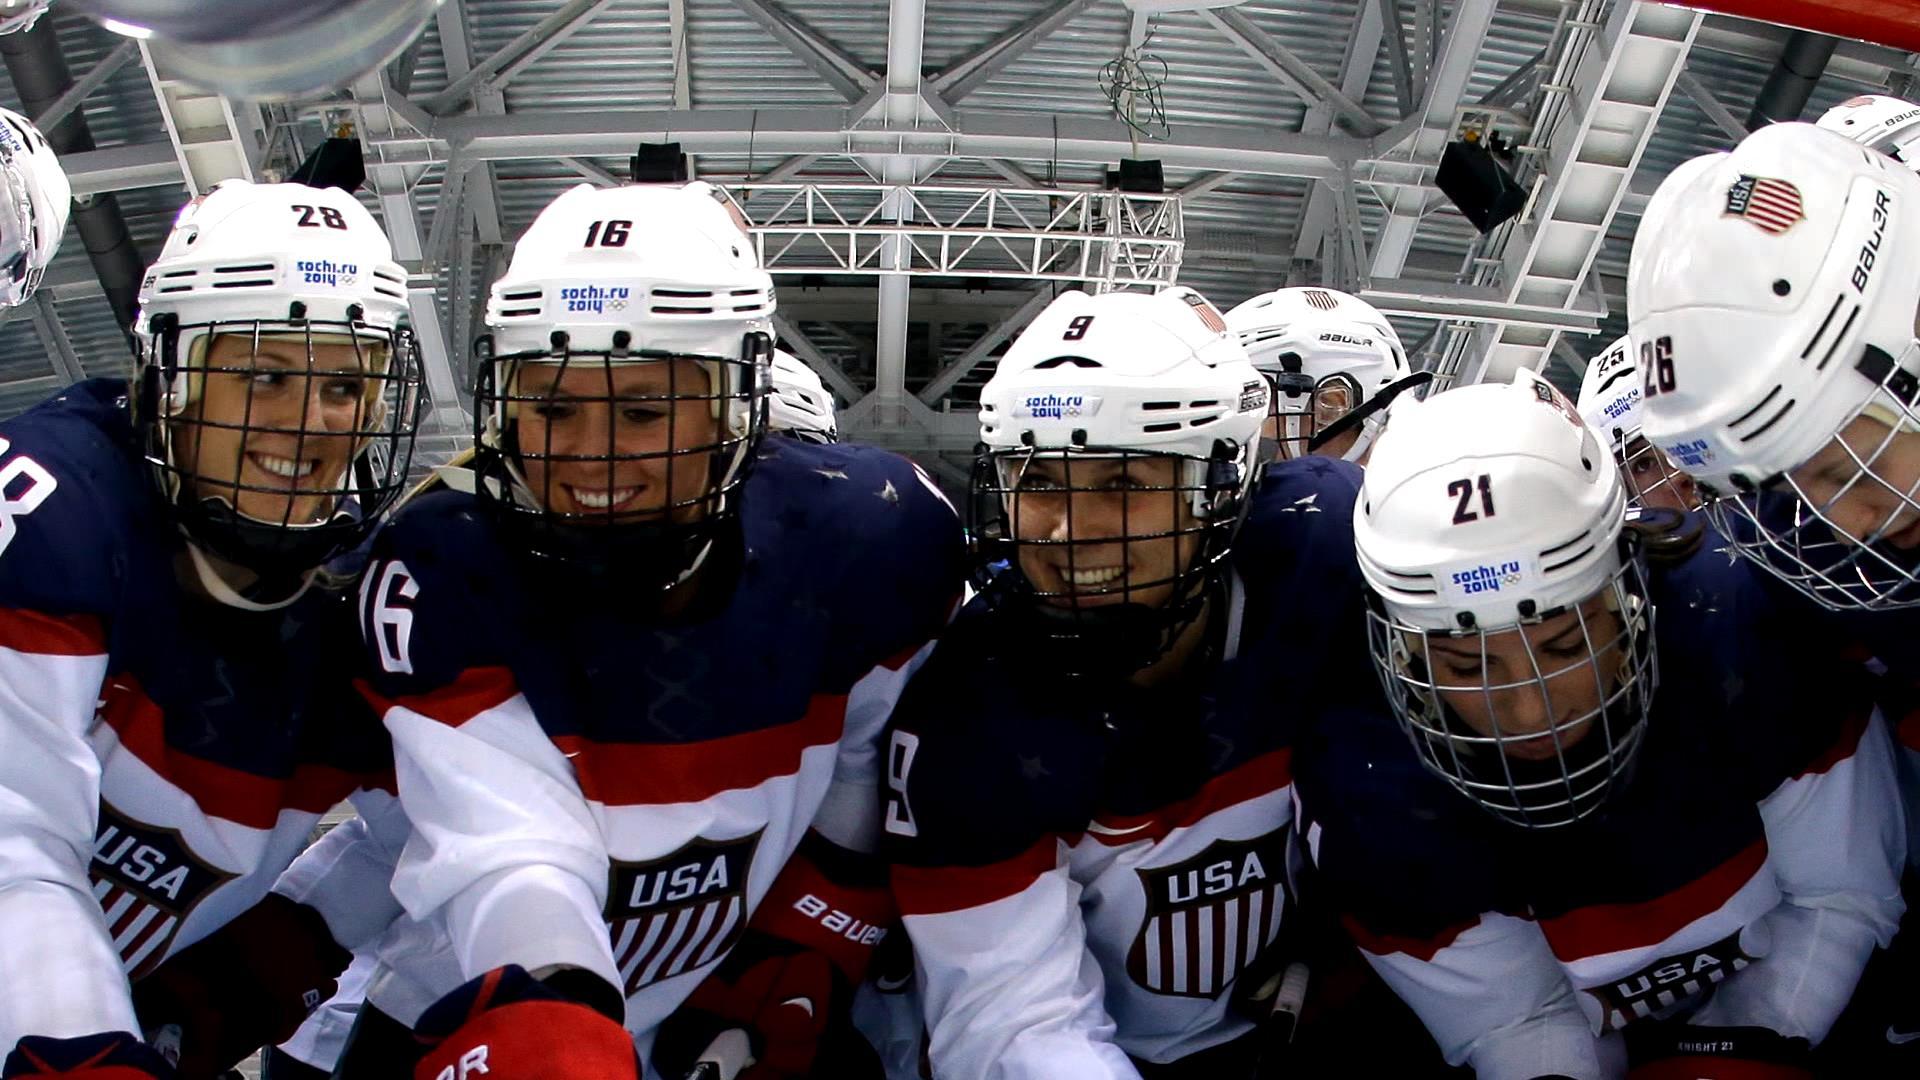 women hockey players threaten boycott over wages